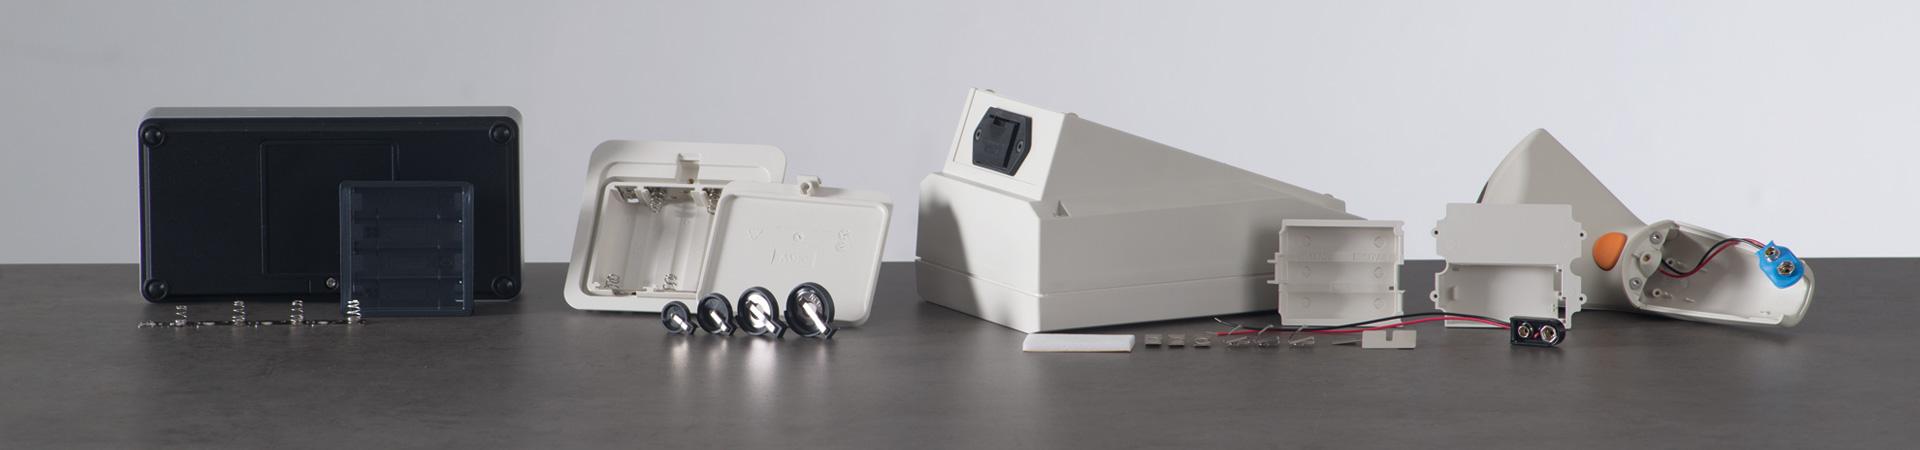 Batteriehalter, Batteriefächer, Knopfzellenhalter